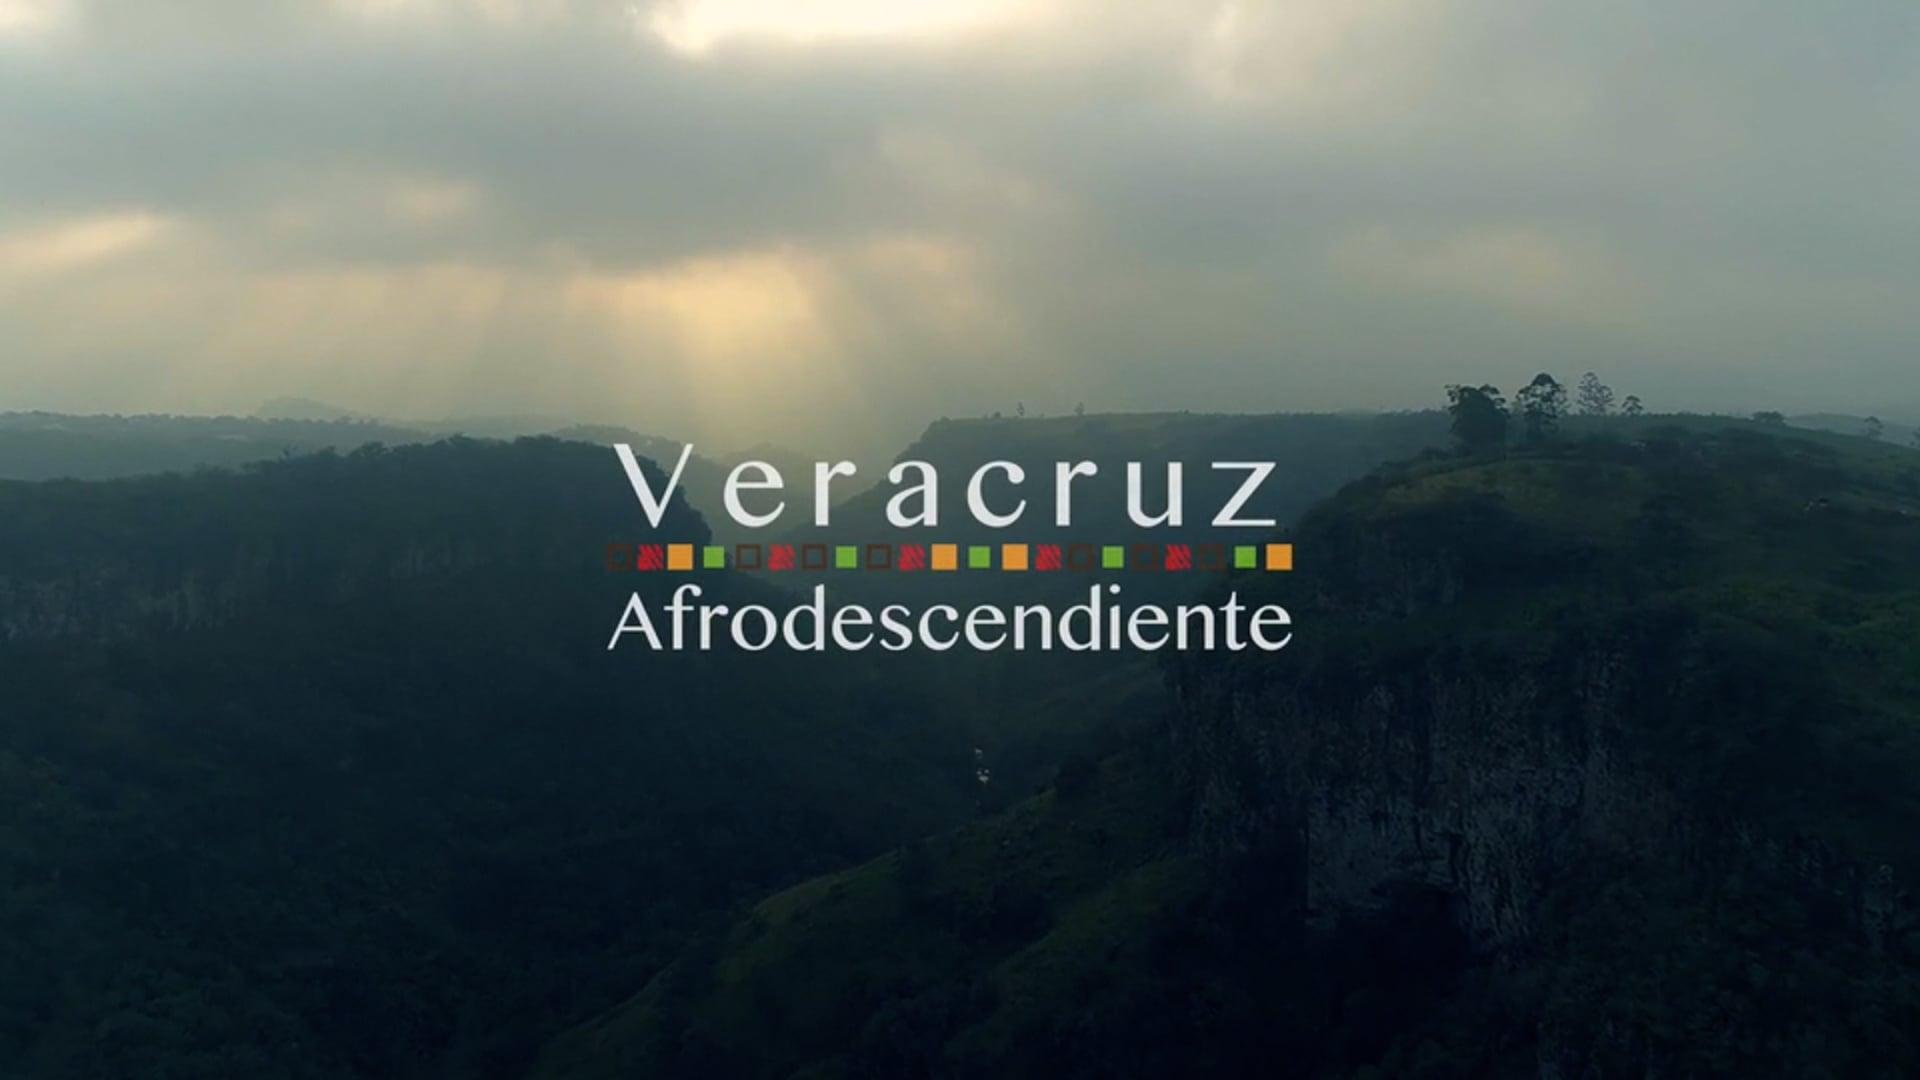 Veracruz Afrodescendiente